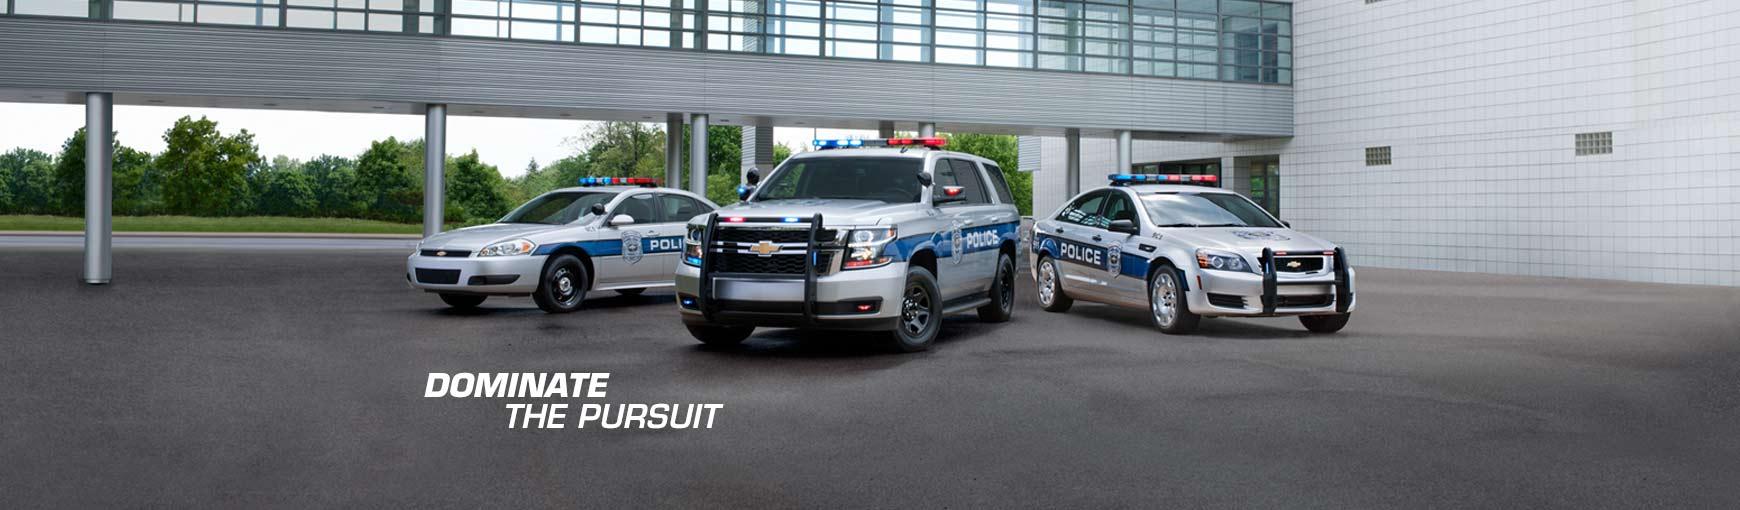 2015-gmfleet-police-page-masthead-1740x510